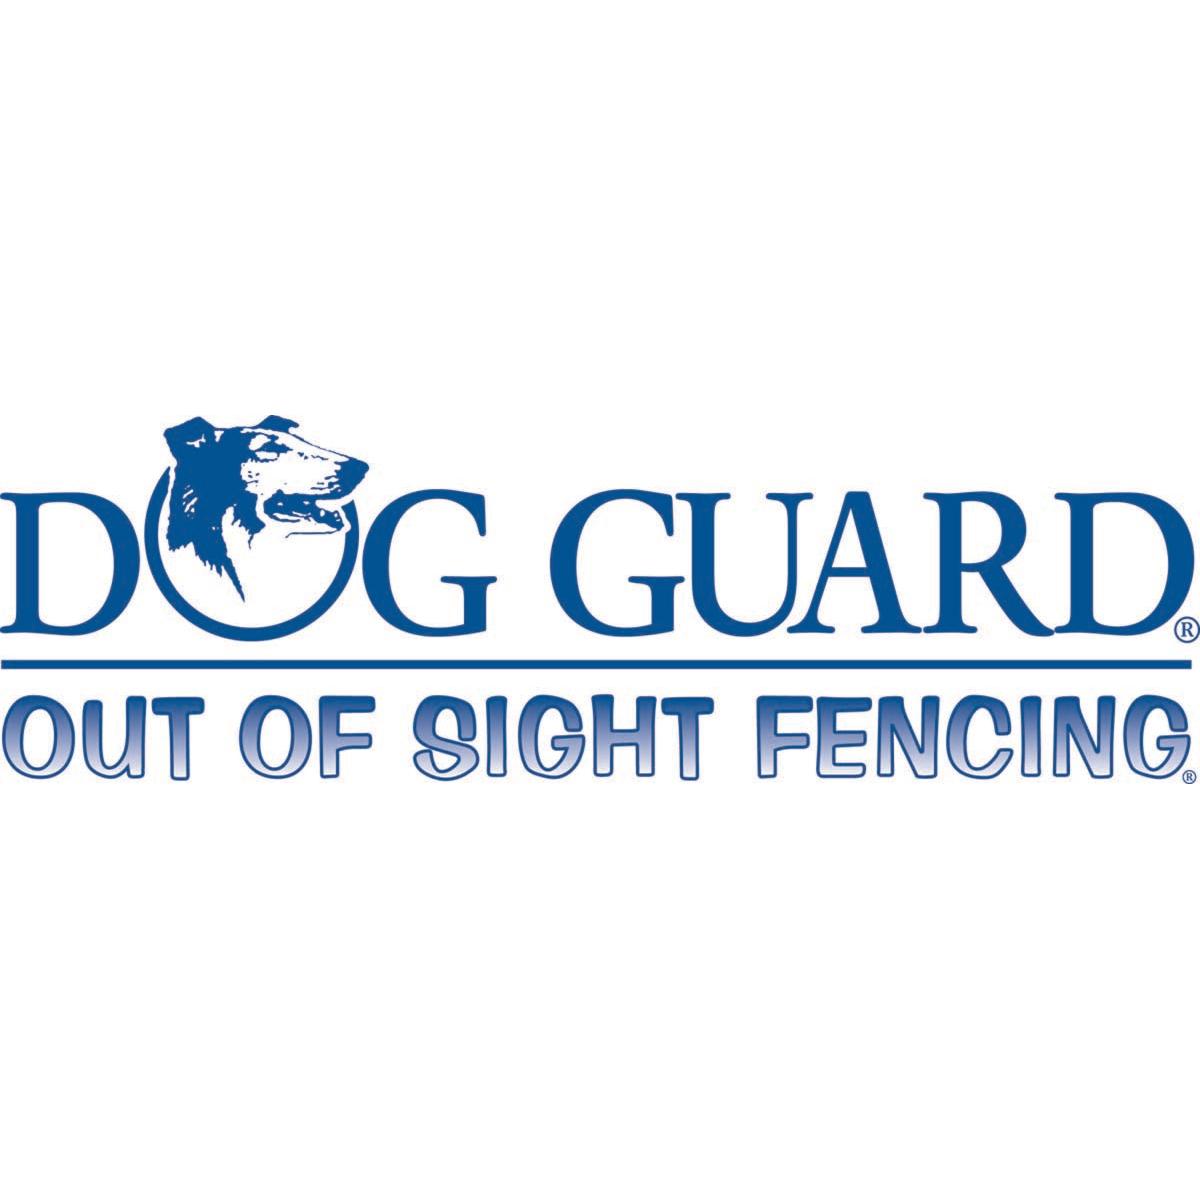 Lonestar Dog Guard